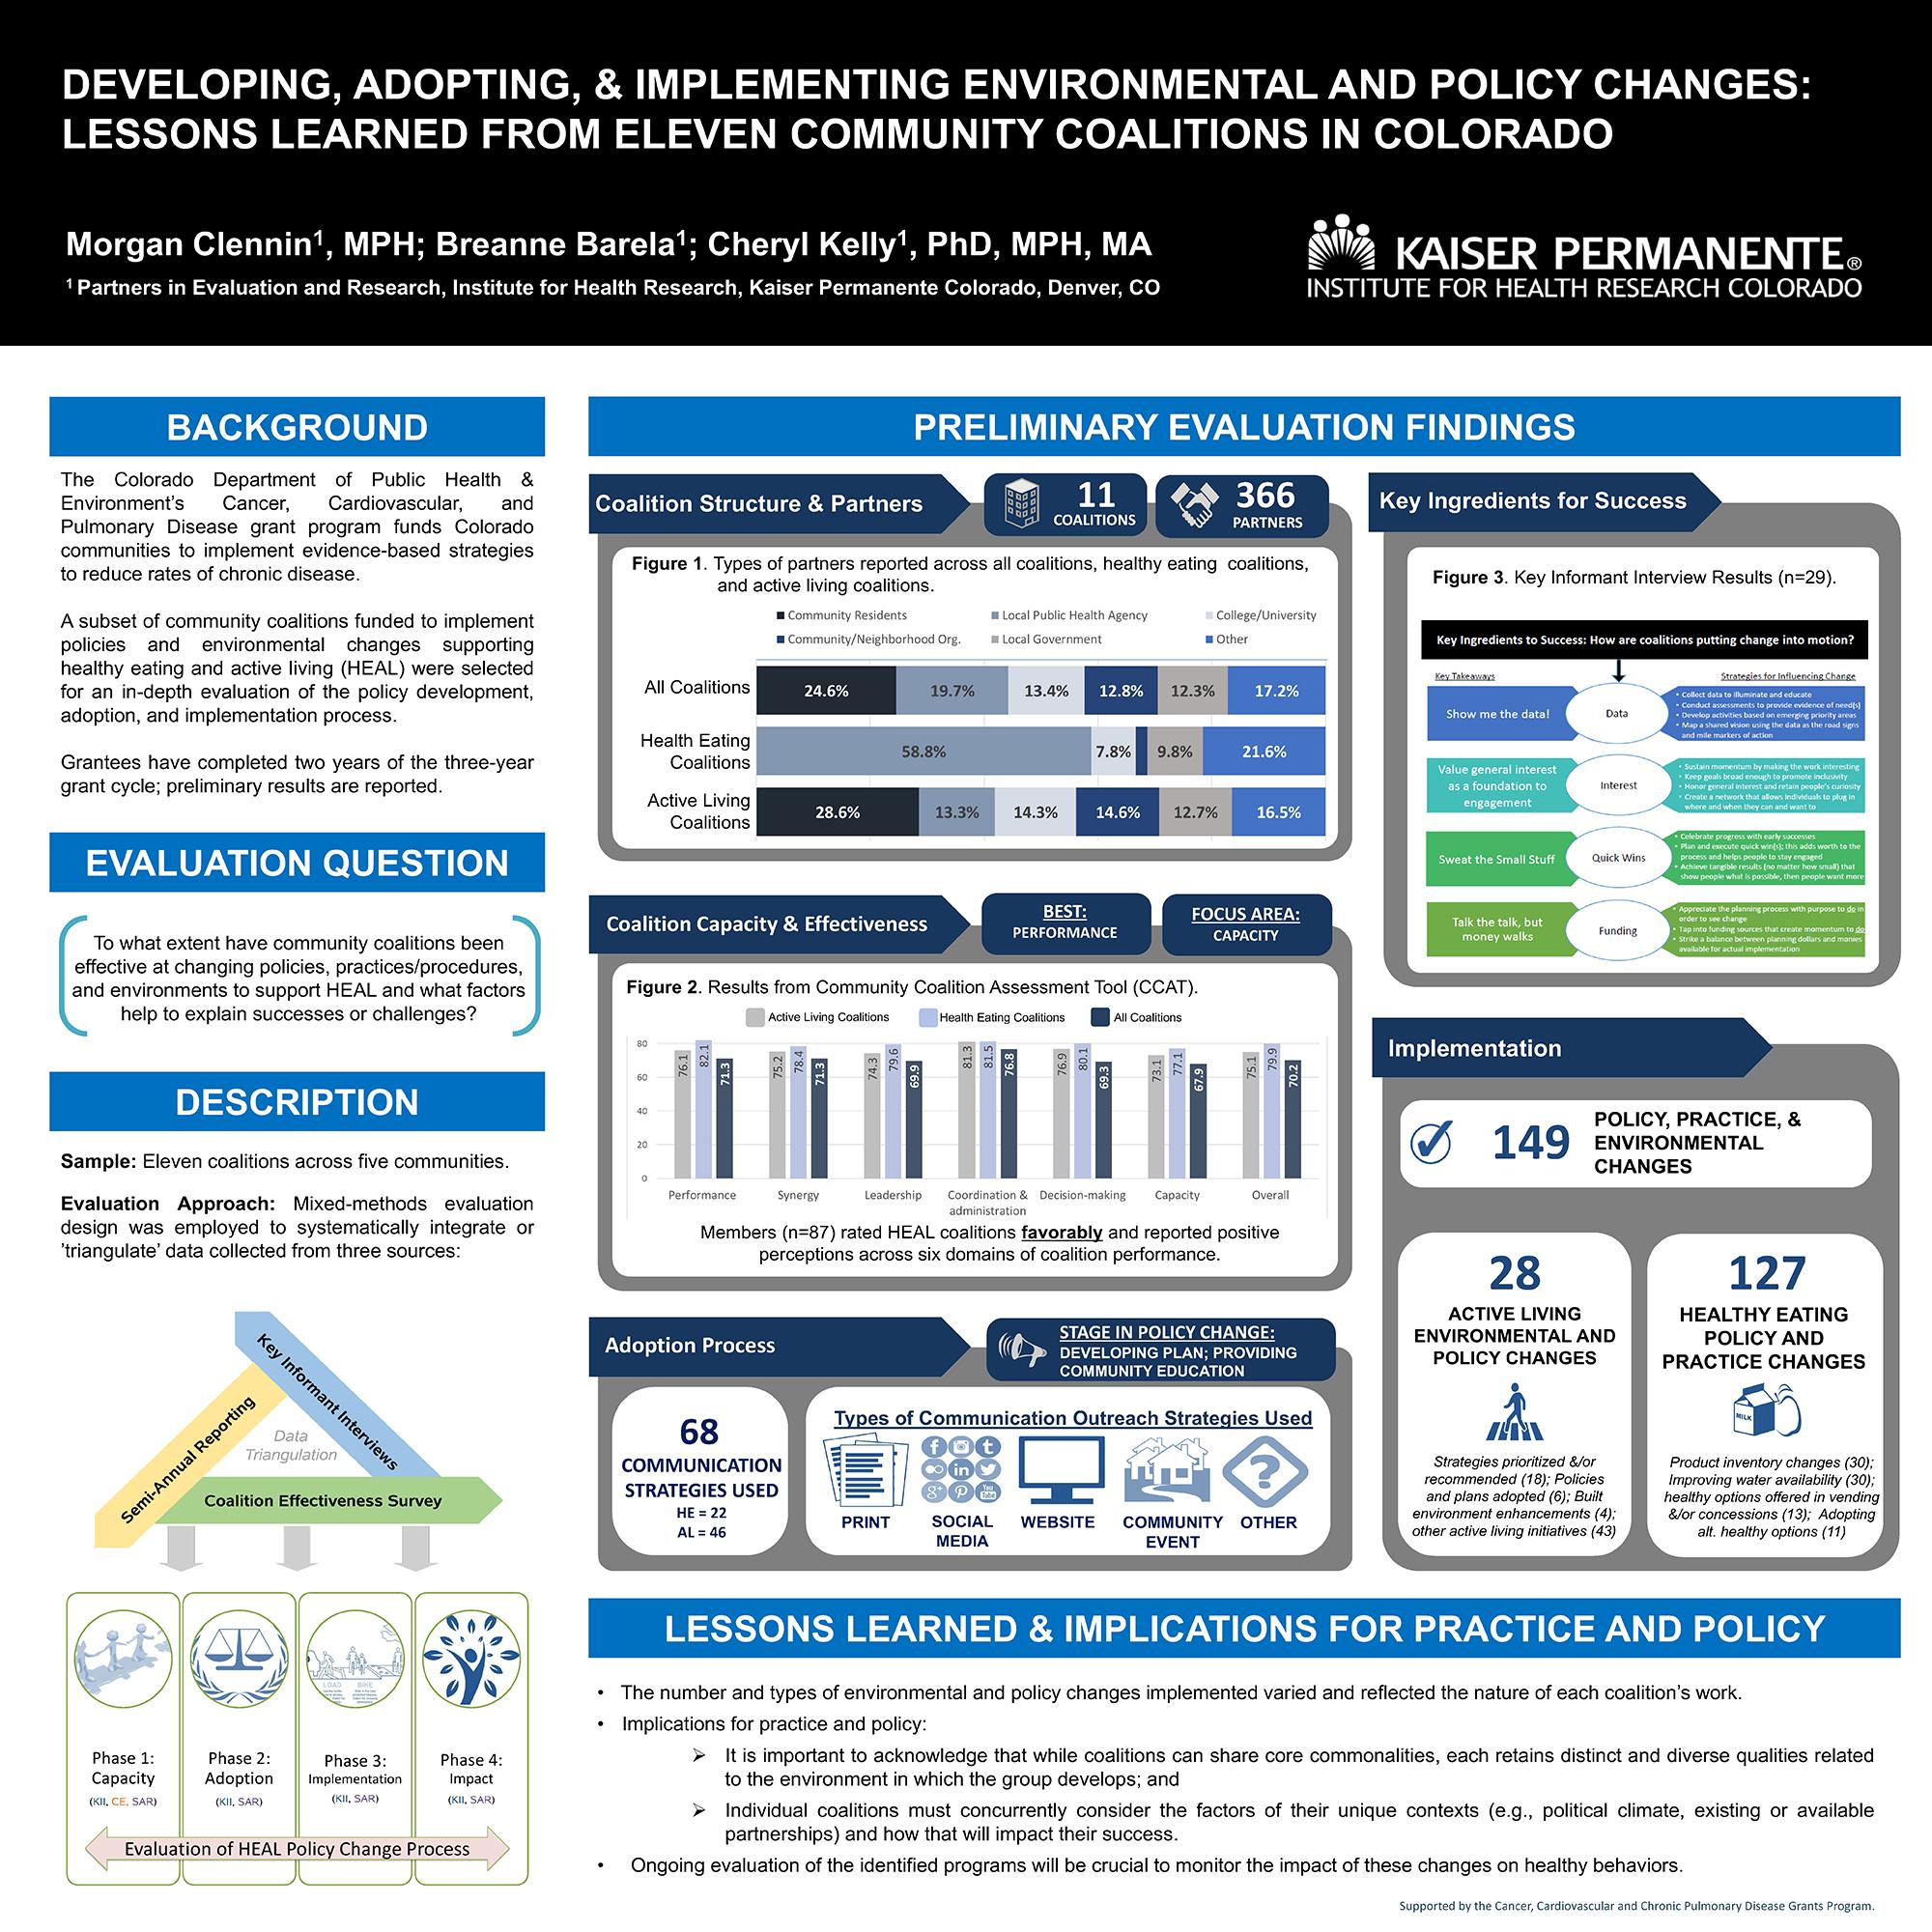 CCPD Heal Policy Data Triangulation 2017